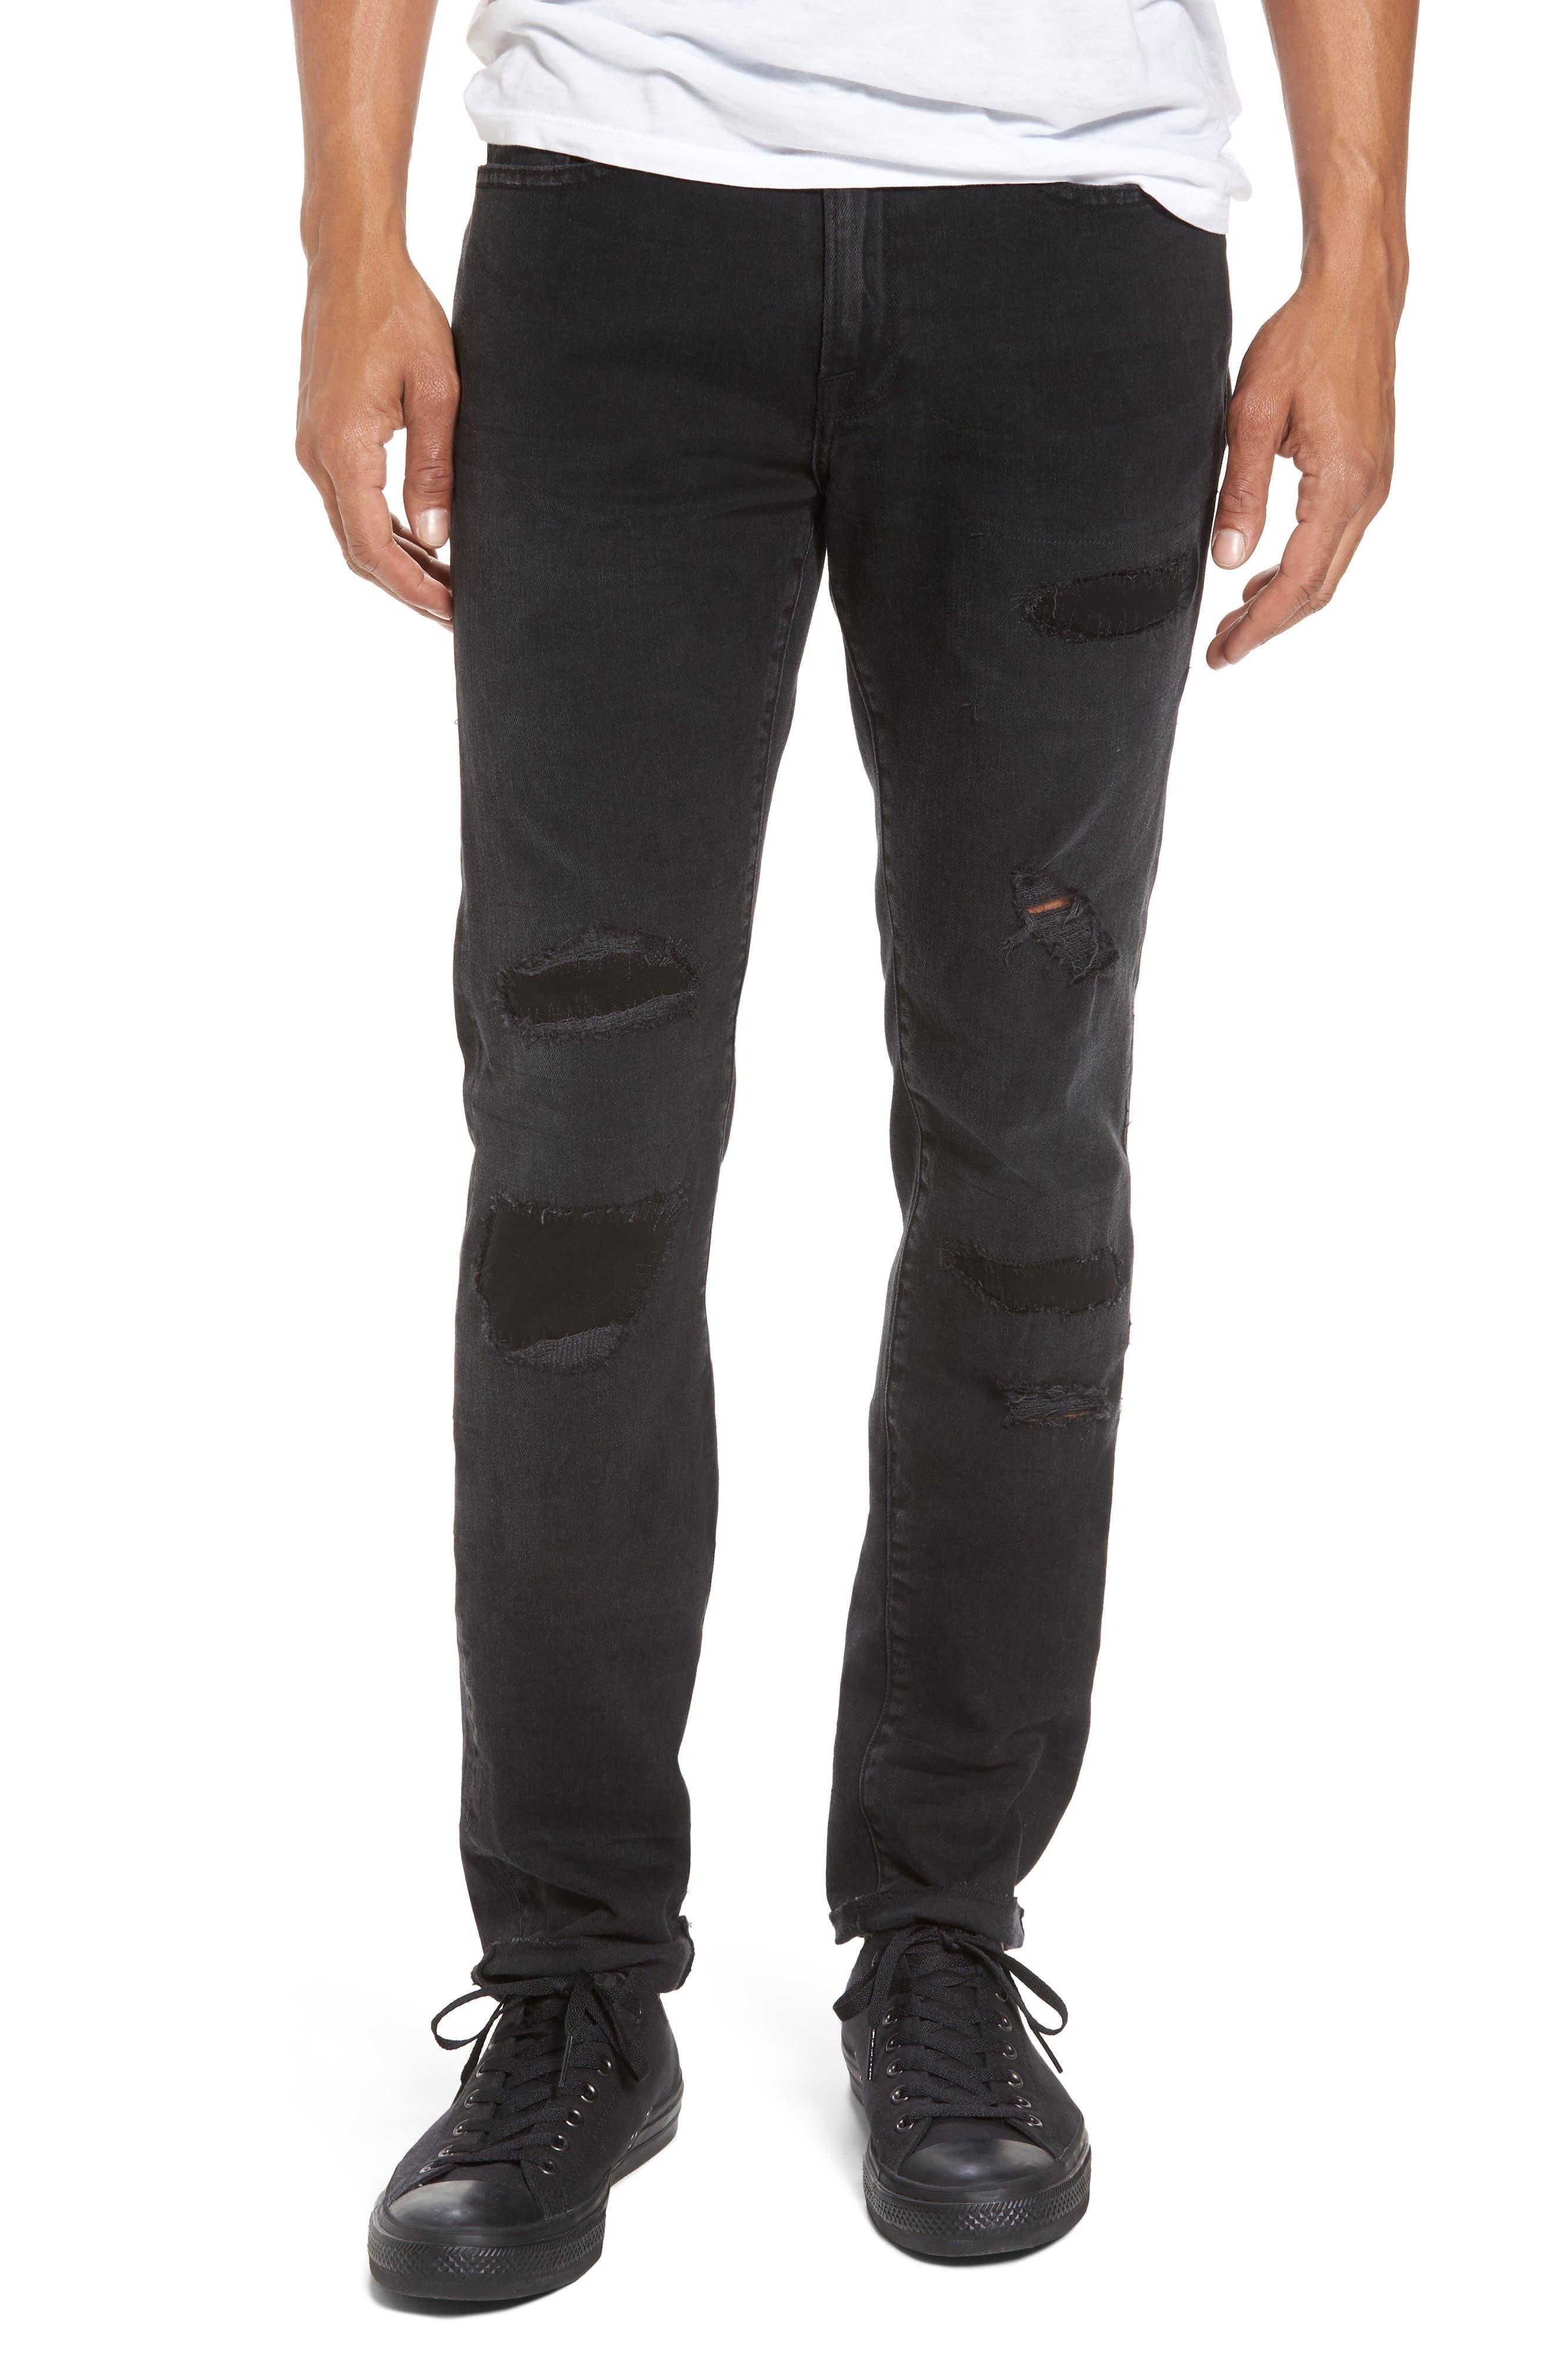 L'Homme Skinny Fit Jeans,                         Main,                         color, 001